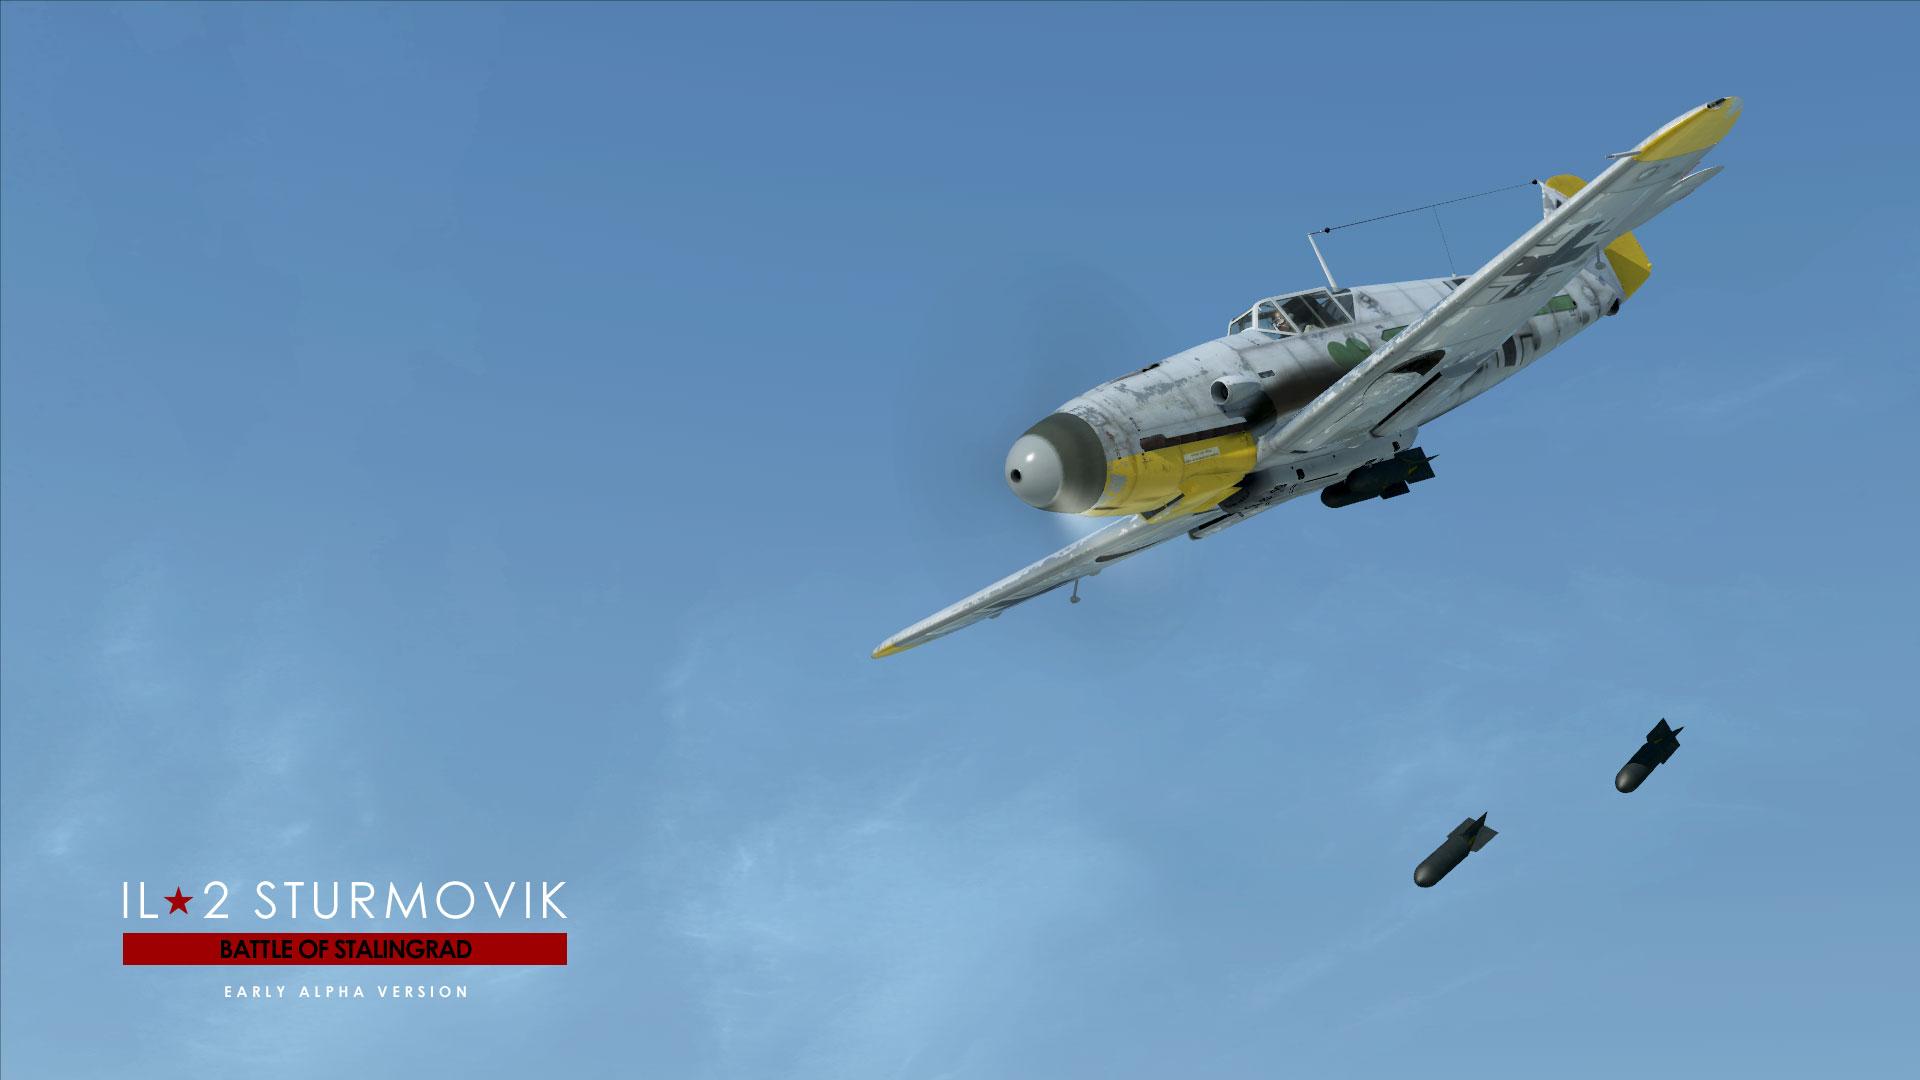 IL-2 Sturmovik: Battle Of Stalingrad Backgrounds on Wallpapers Vista